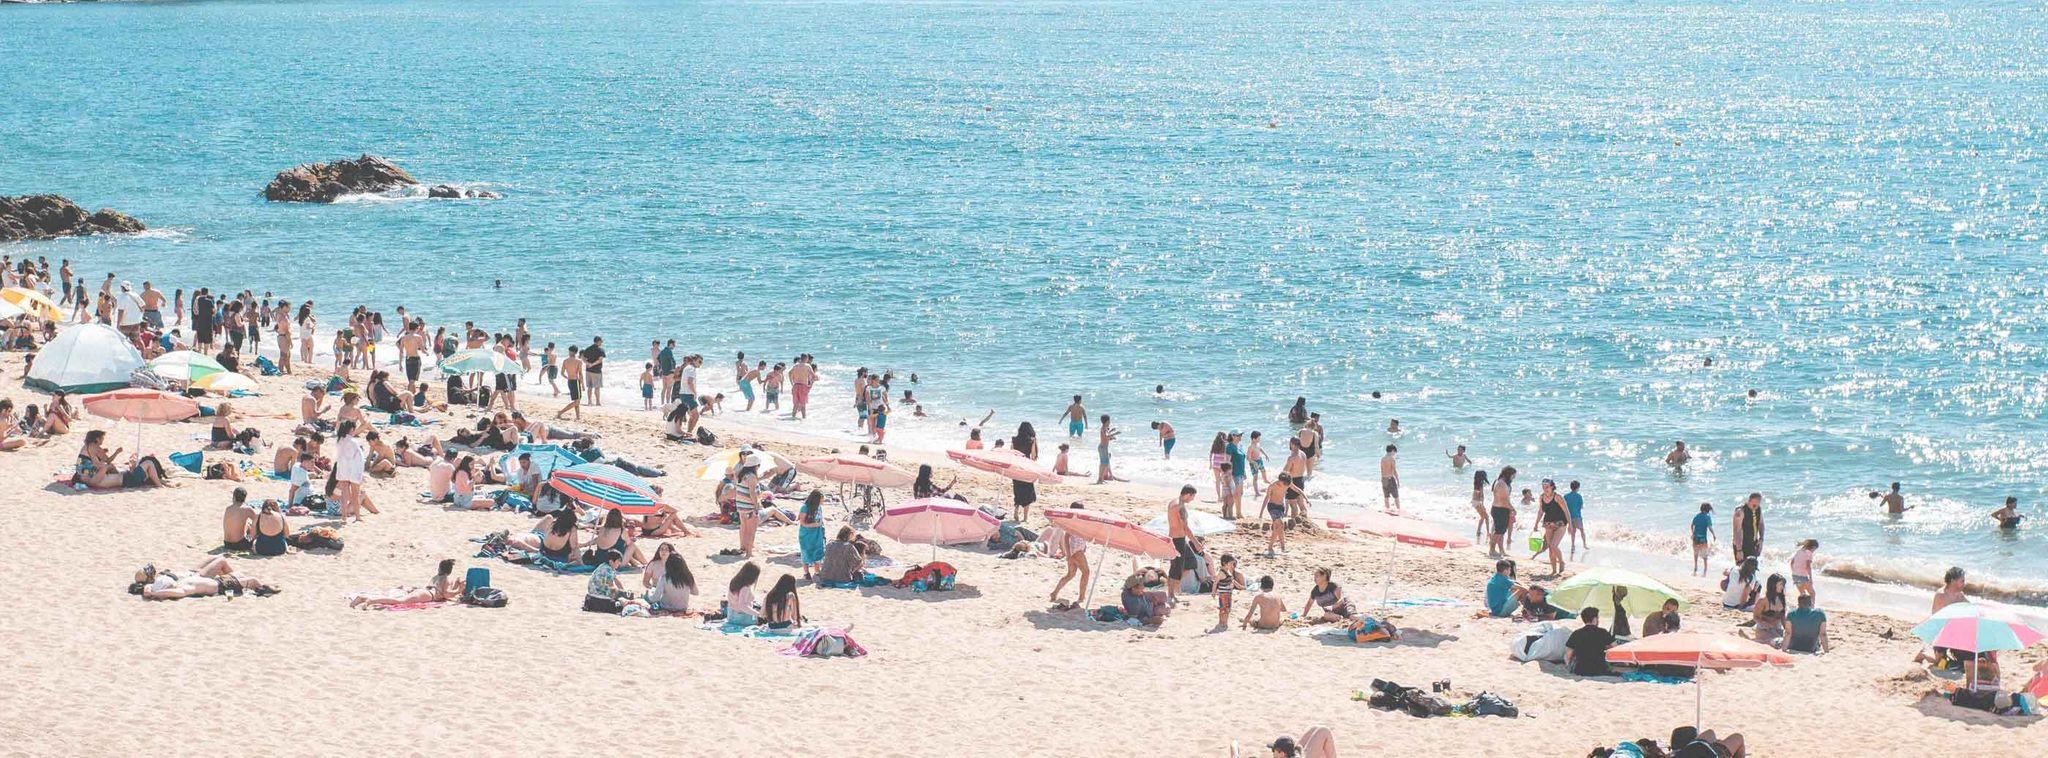 Urlaub im Corona-Risikogebiet